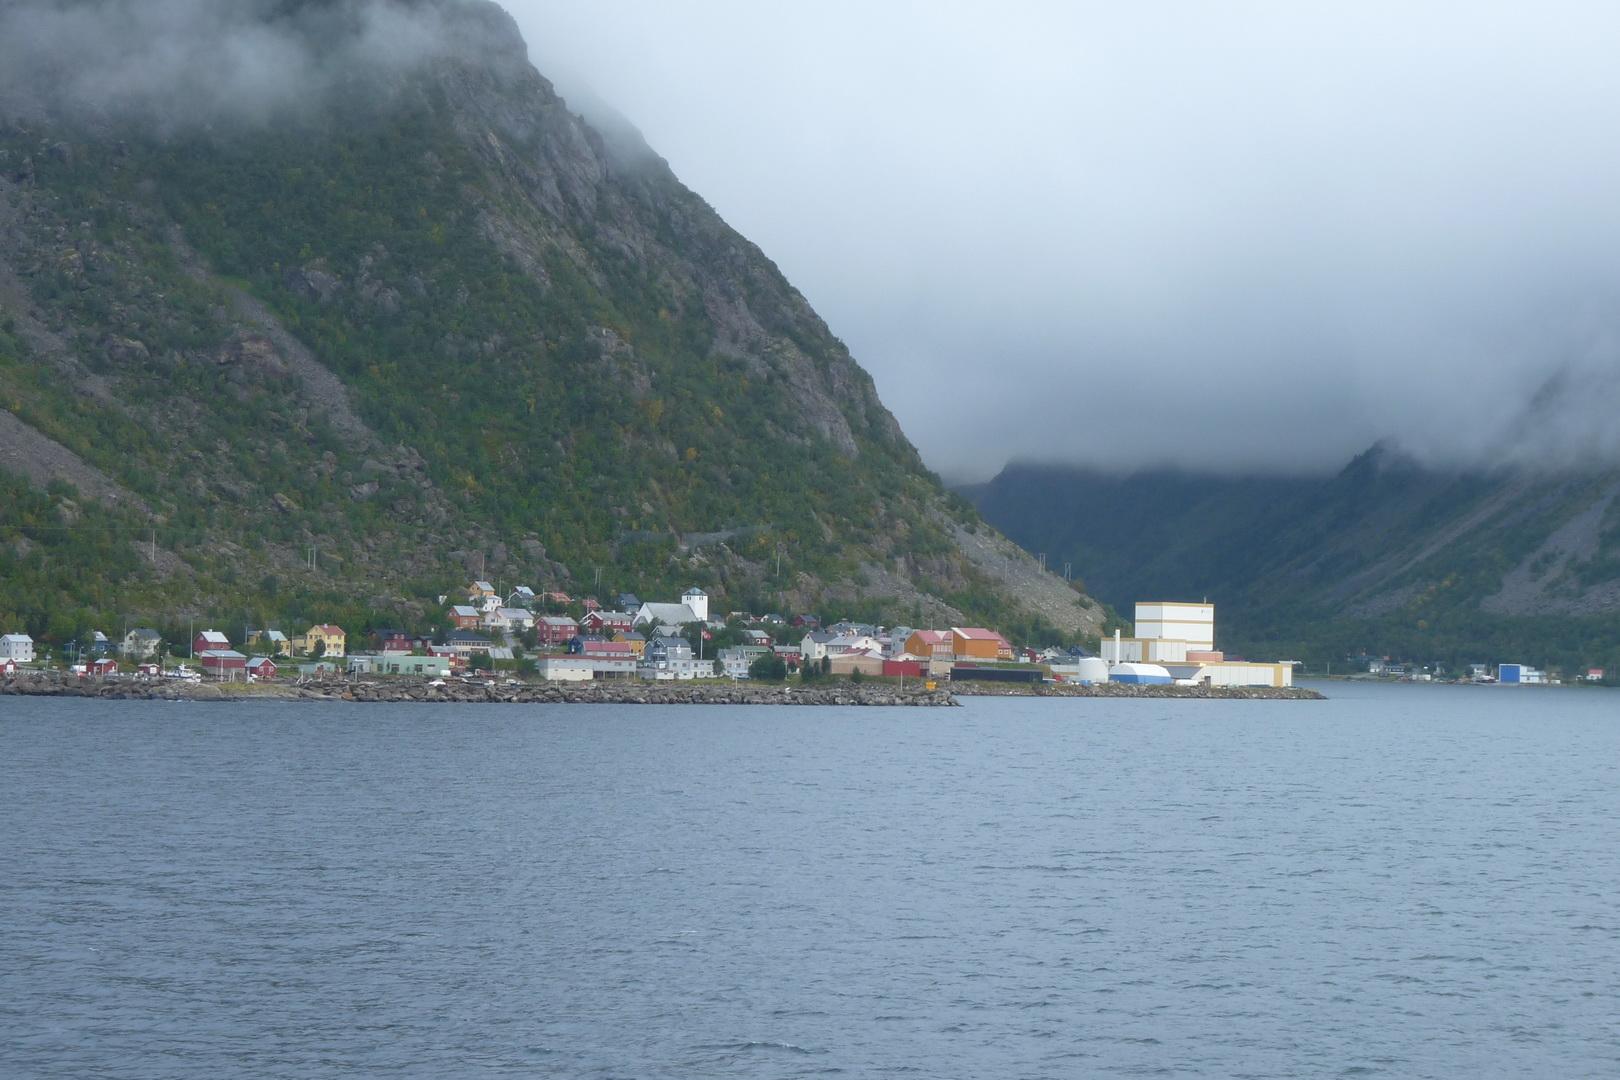 216 Ksfjord